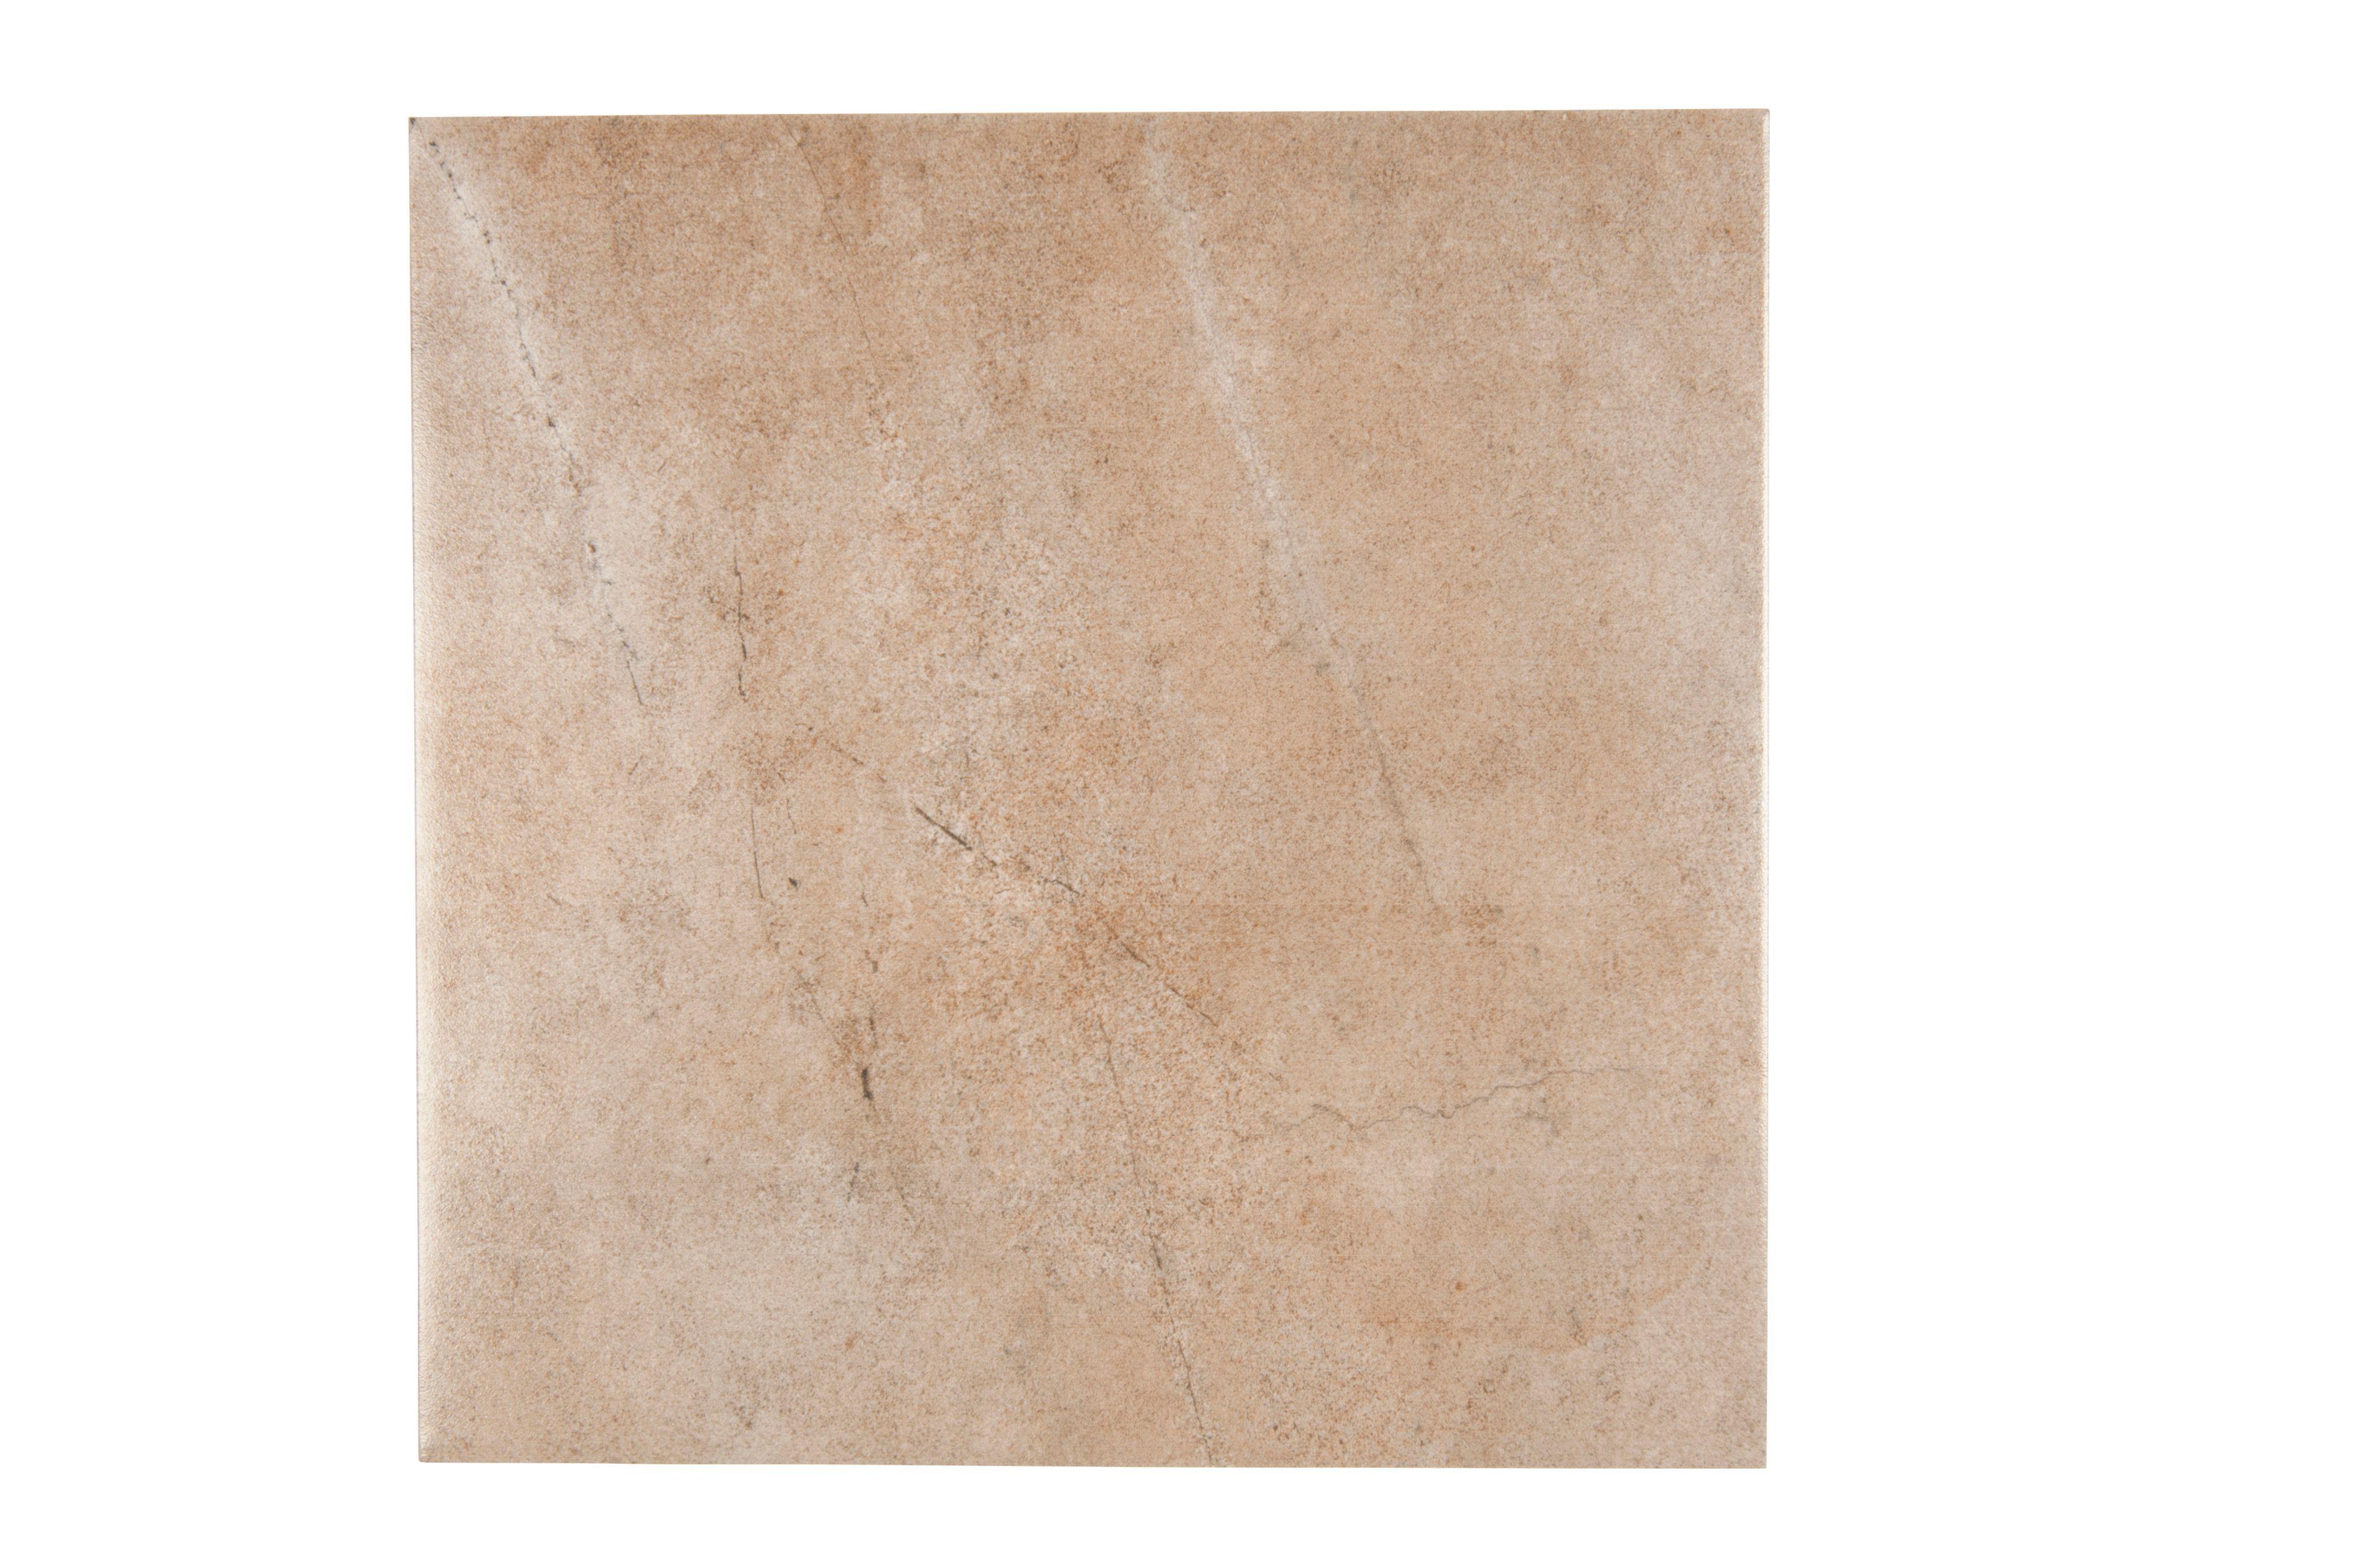 Legend beige stone effect porcelain floor tile pack of 9 l333mm legend beige stone effect porcelain floor tile pack of 9 l333mm w333mm departments diy at bq dailygadgetfo Gallery